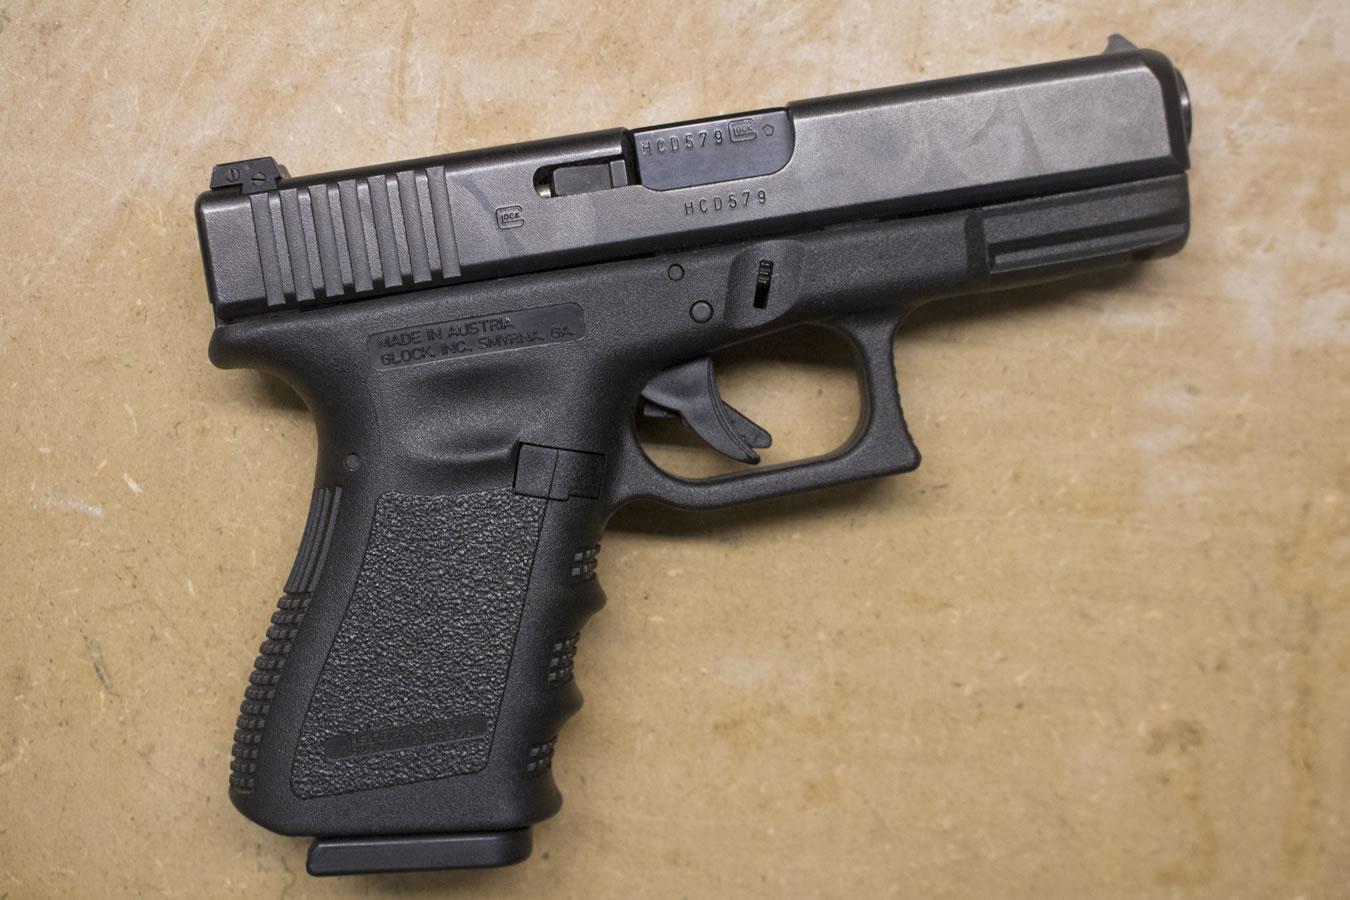 Glock 38 Gen3 45 GAP Police Trade-ins (Very Good Condition) | Sportsman's Outdoor Superstore